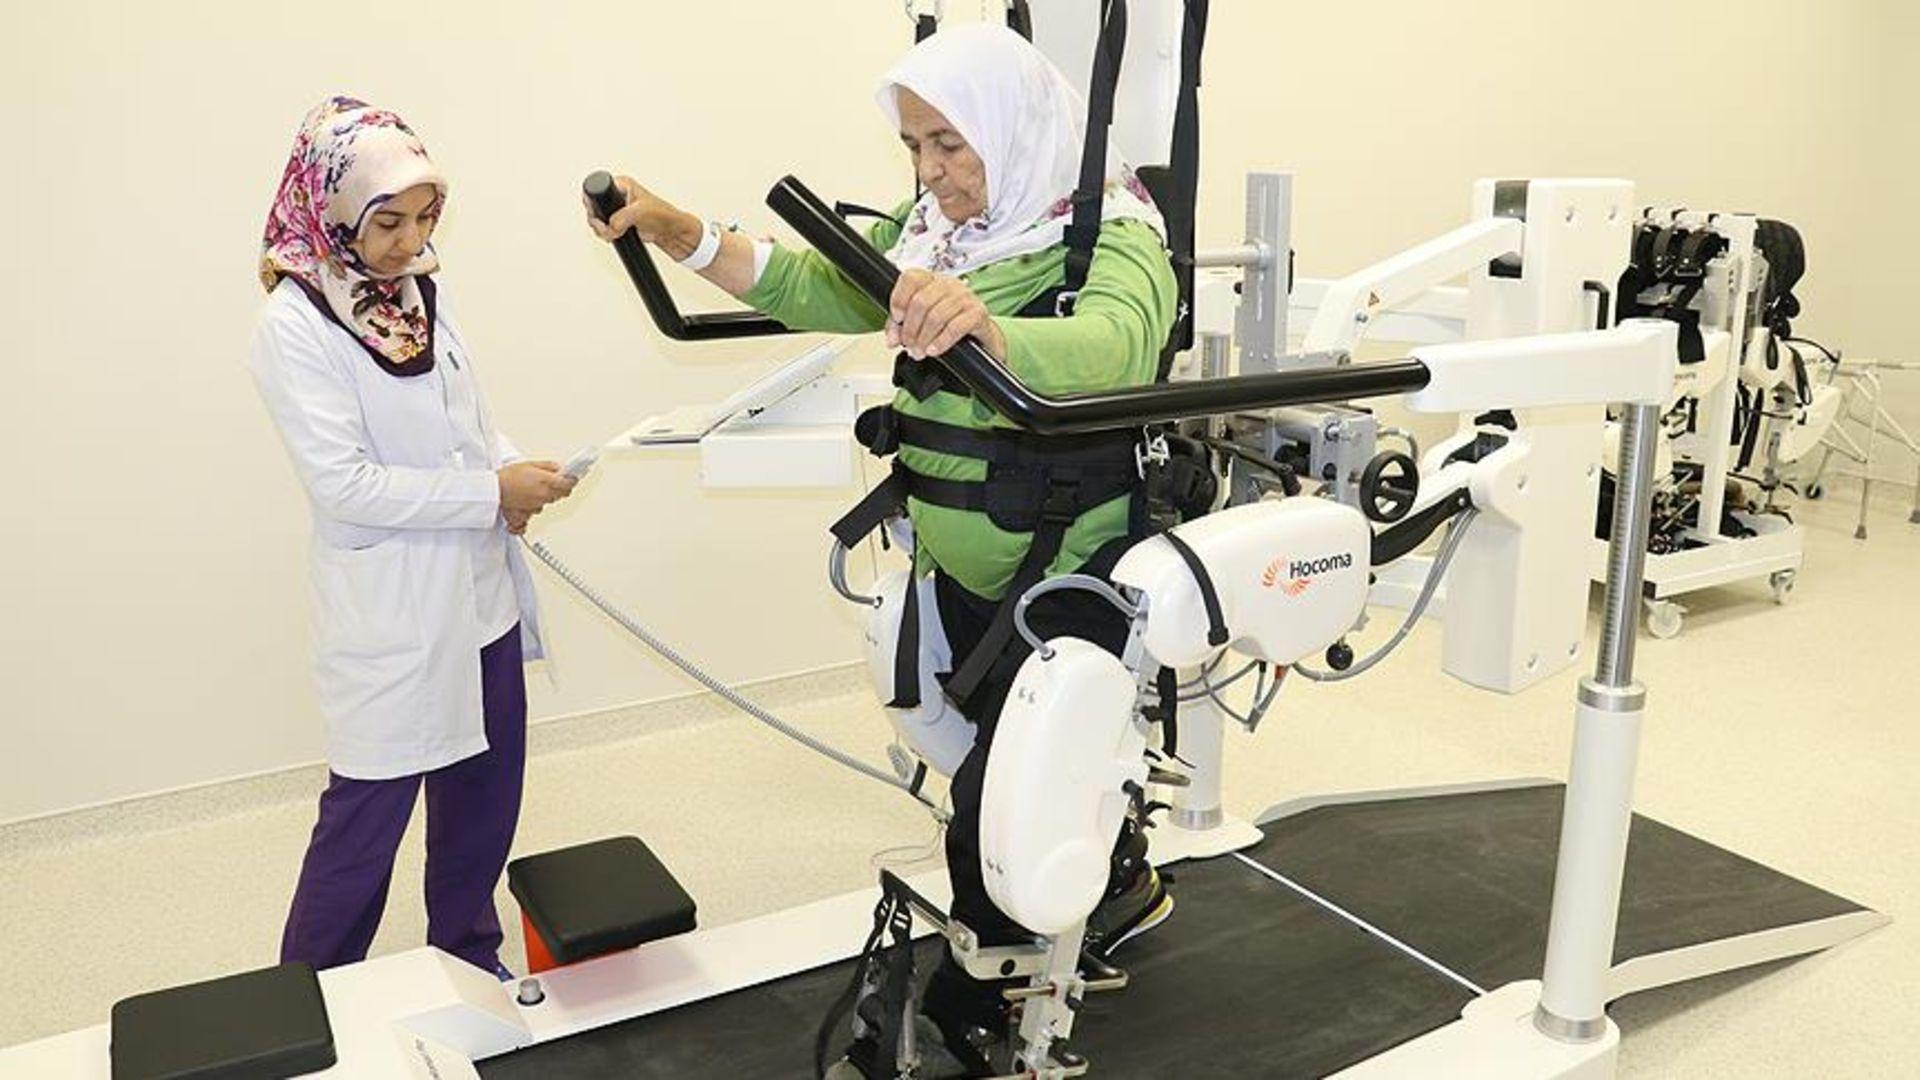 Yürüme robotu hastalara umut oldu